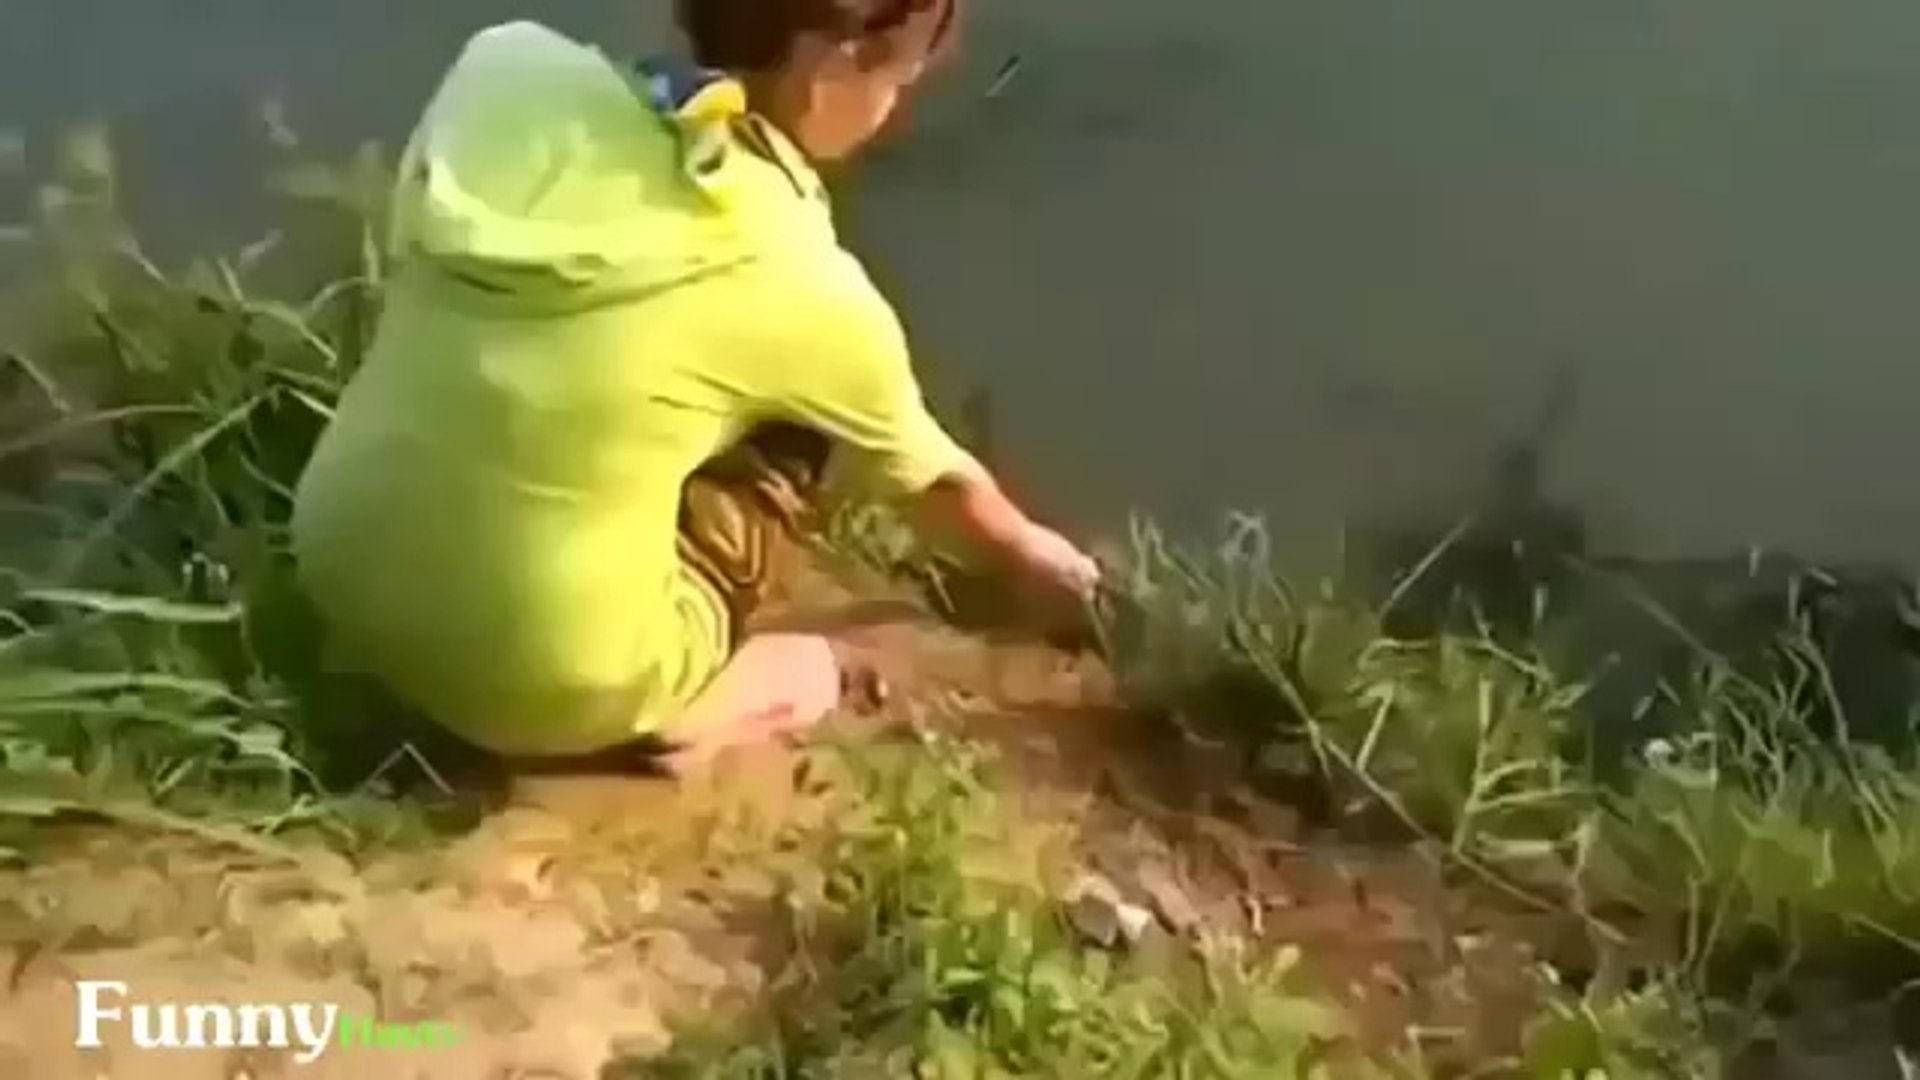 Funny Videos Funny Pranks Funny Girls Funny Animals Fails